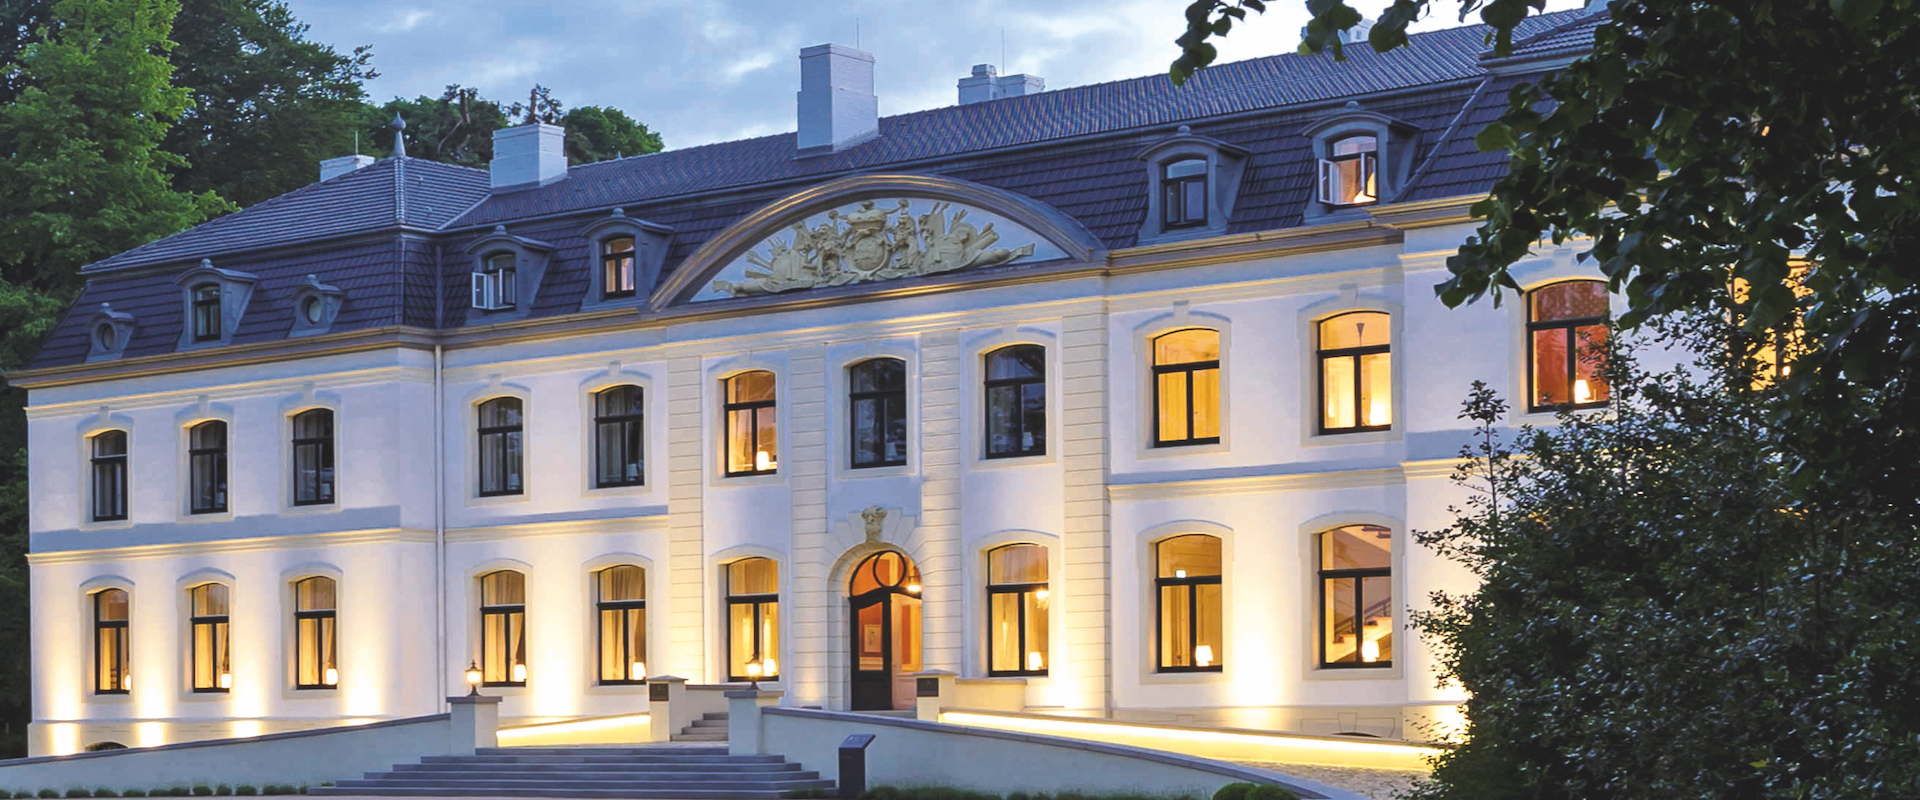 Weissenhaus Grand Village Resort & Spa am Meer_KlockeVerlag